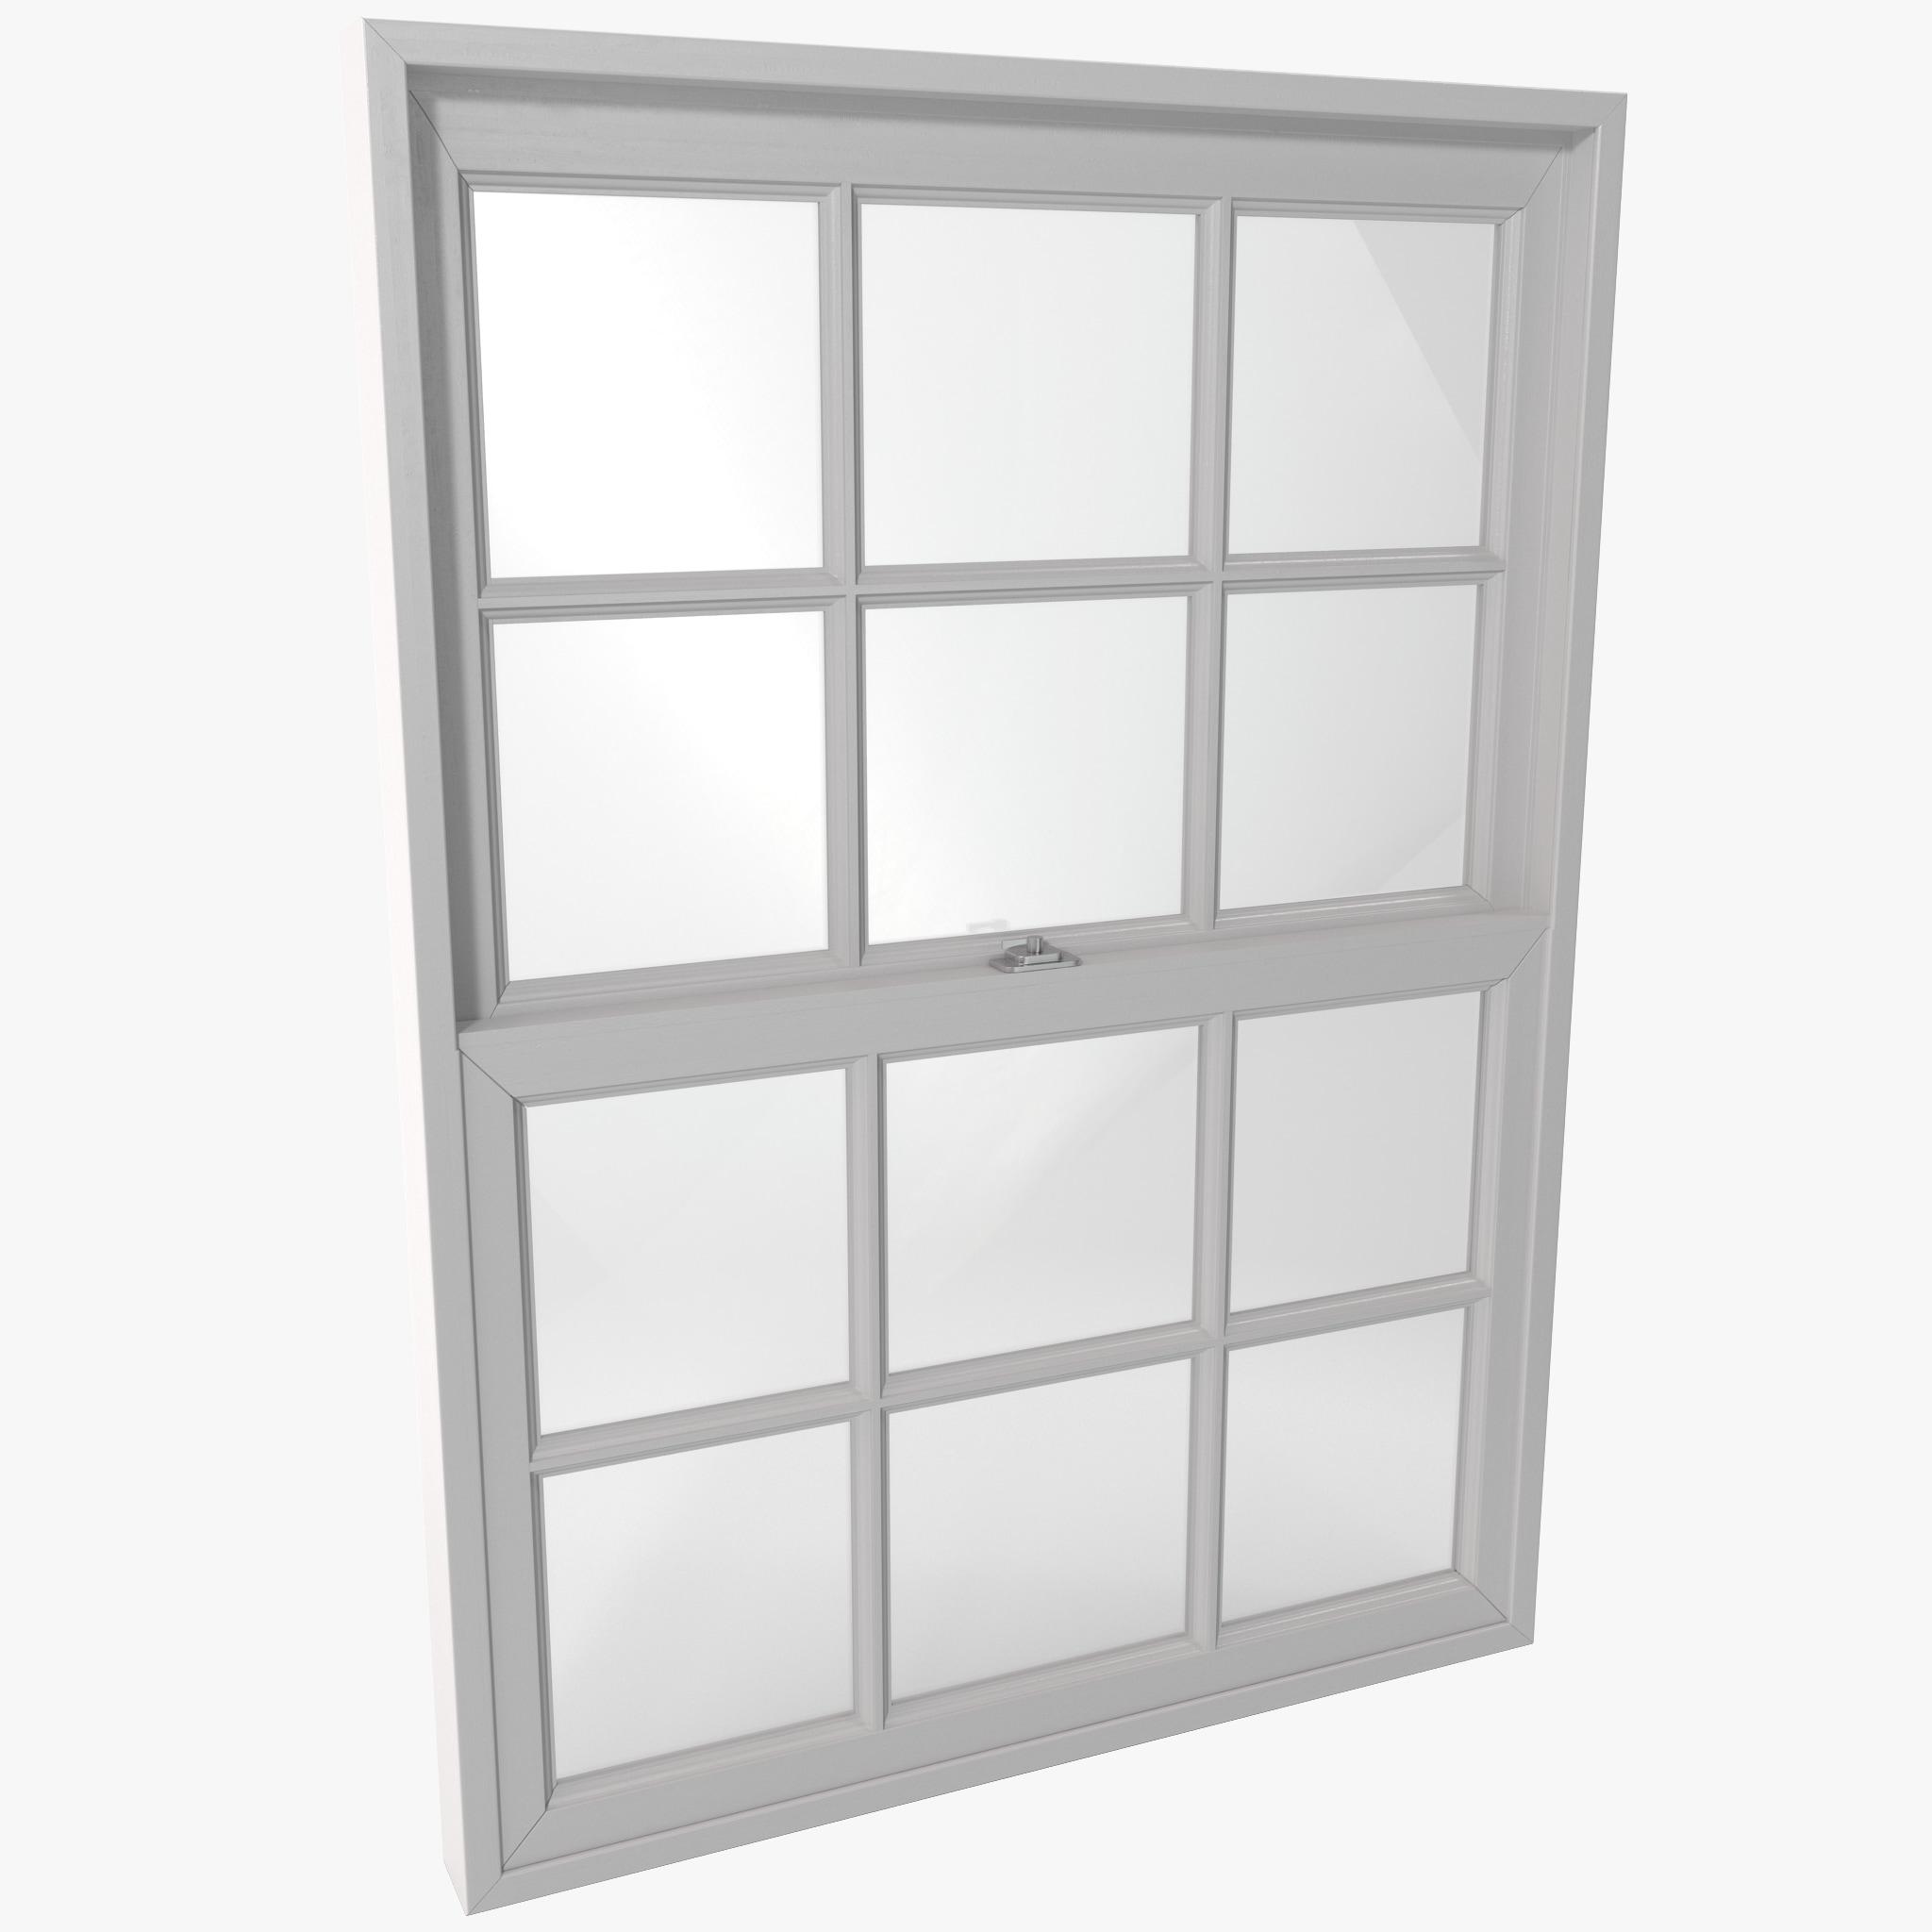 Double_Hung_Window_000.jpg